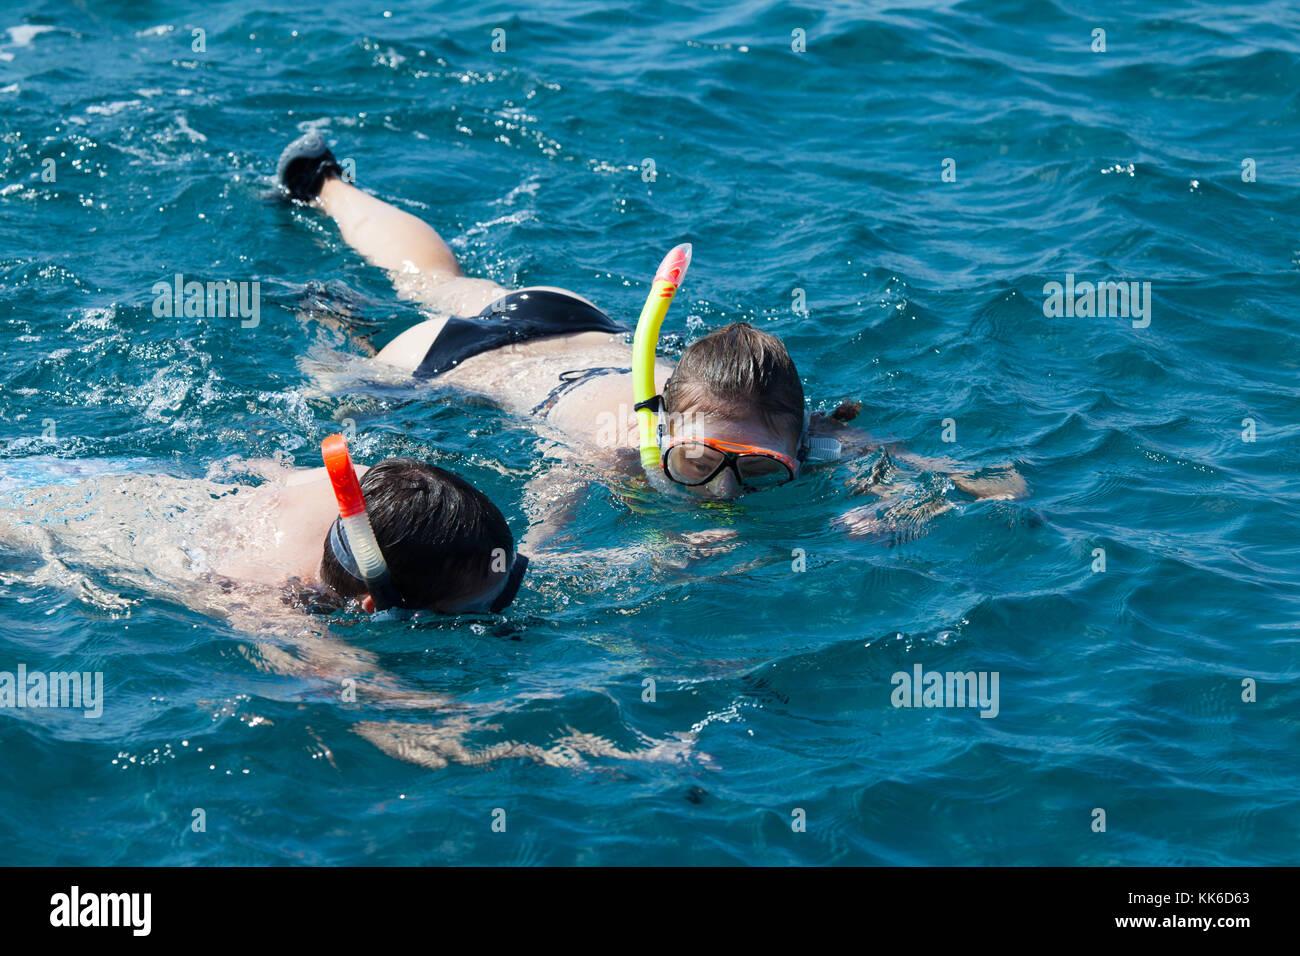 Snorkeling Near South Padre Island